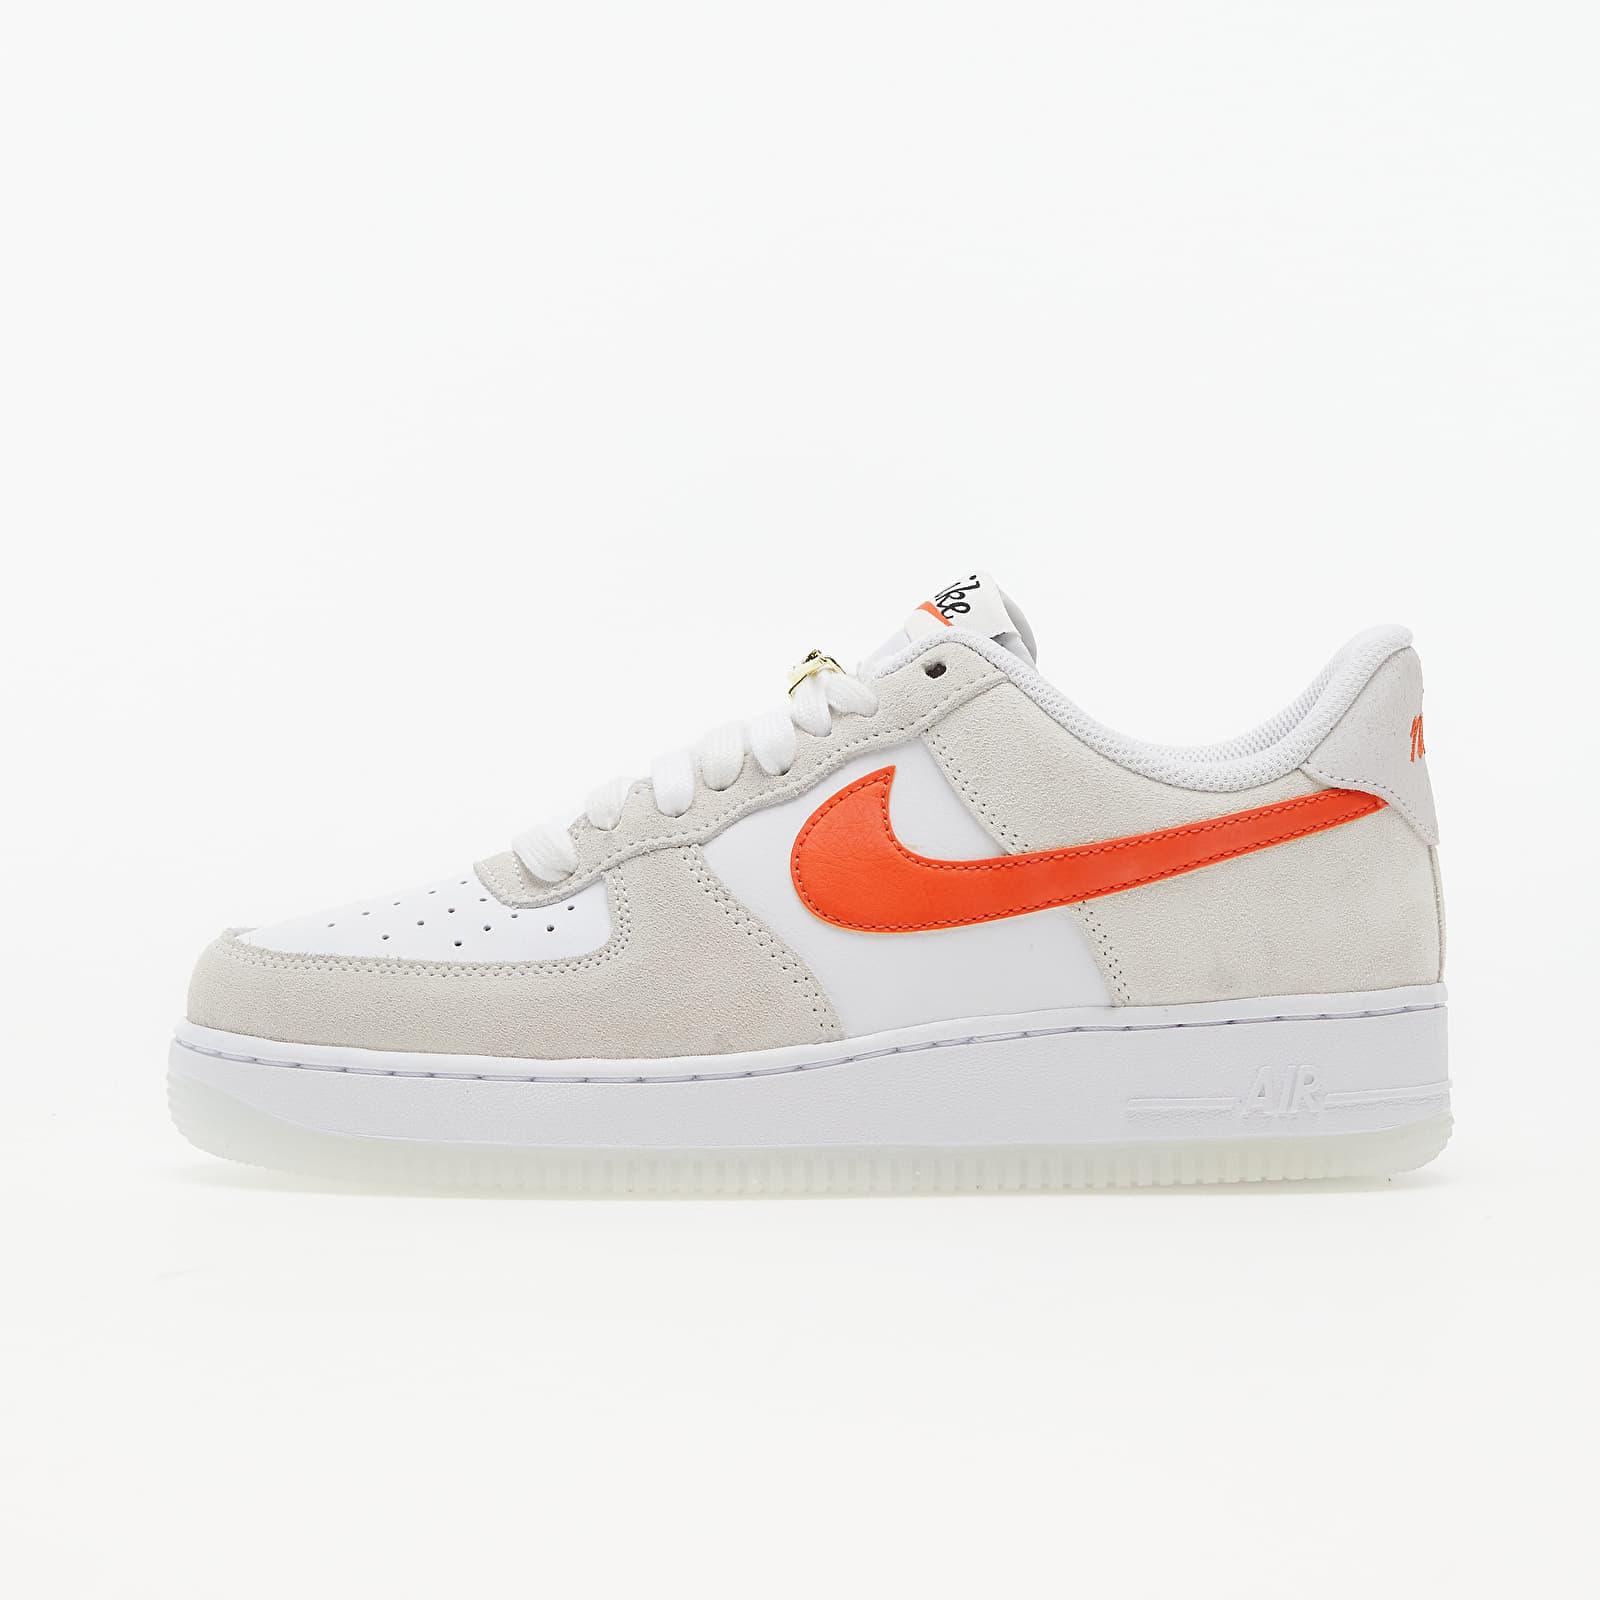 Nike Air Force 1 '07 SE White/ Orange-Summit White-Sail EUR 38